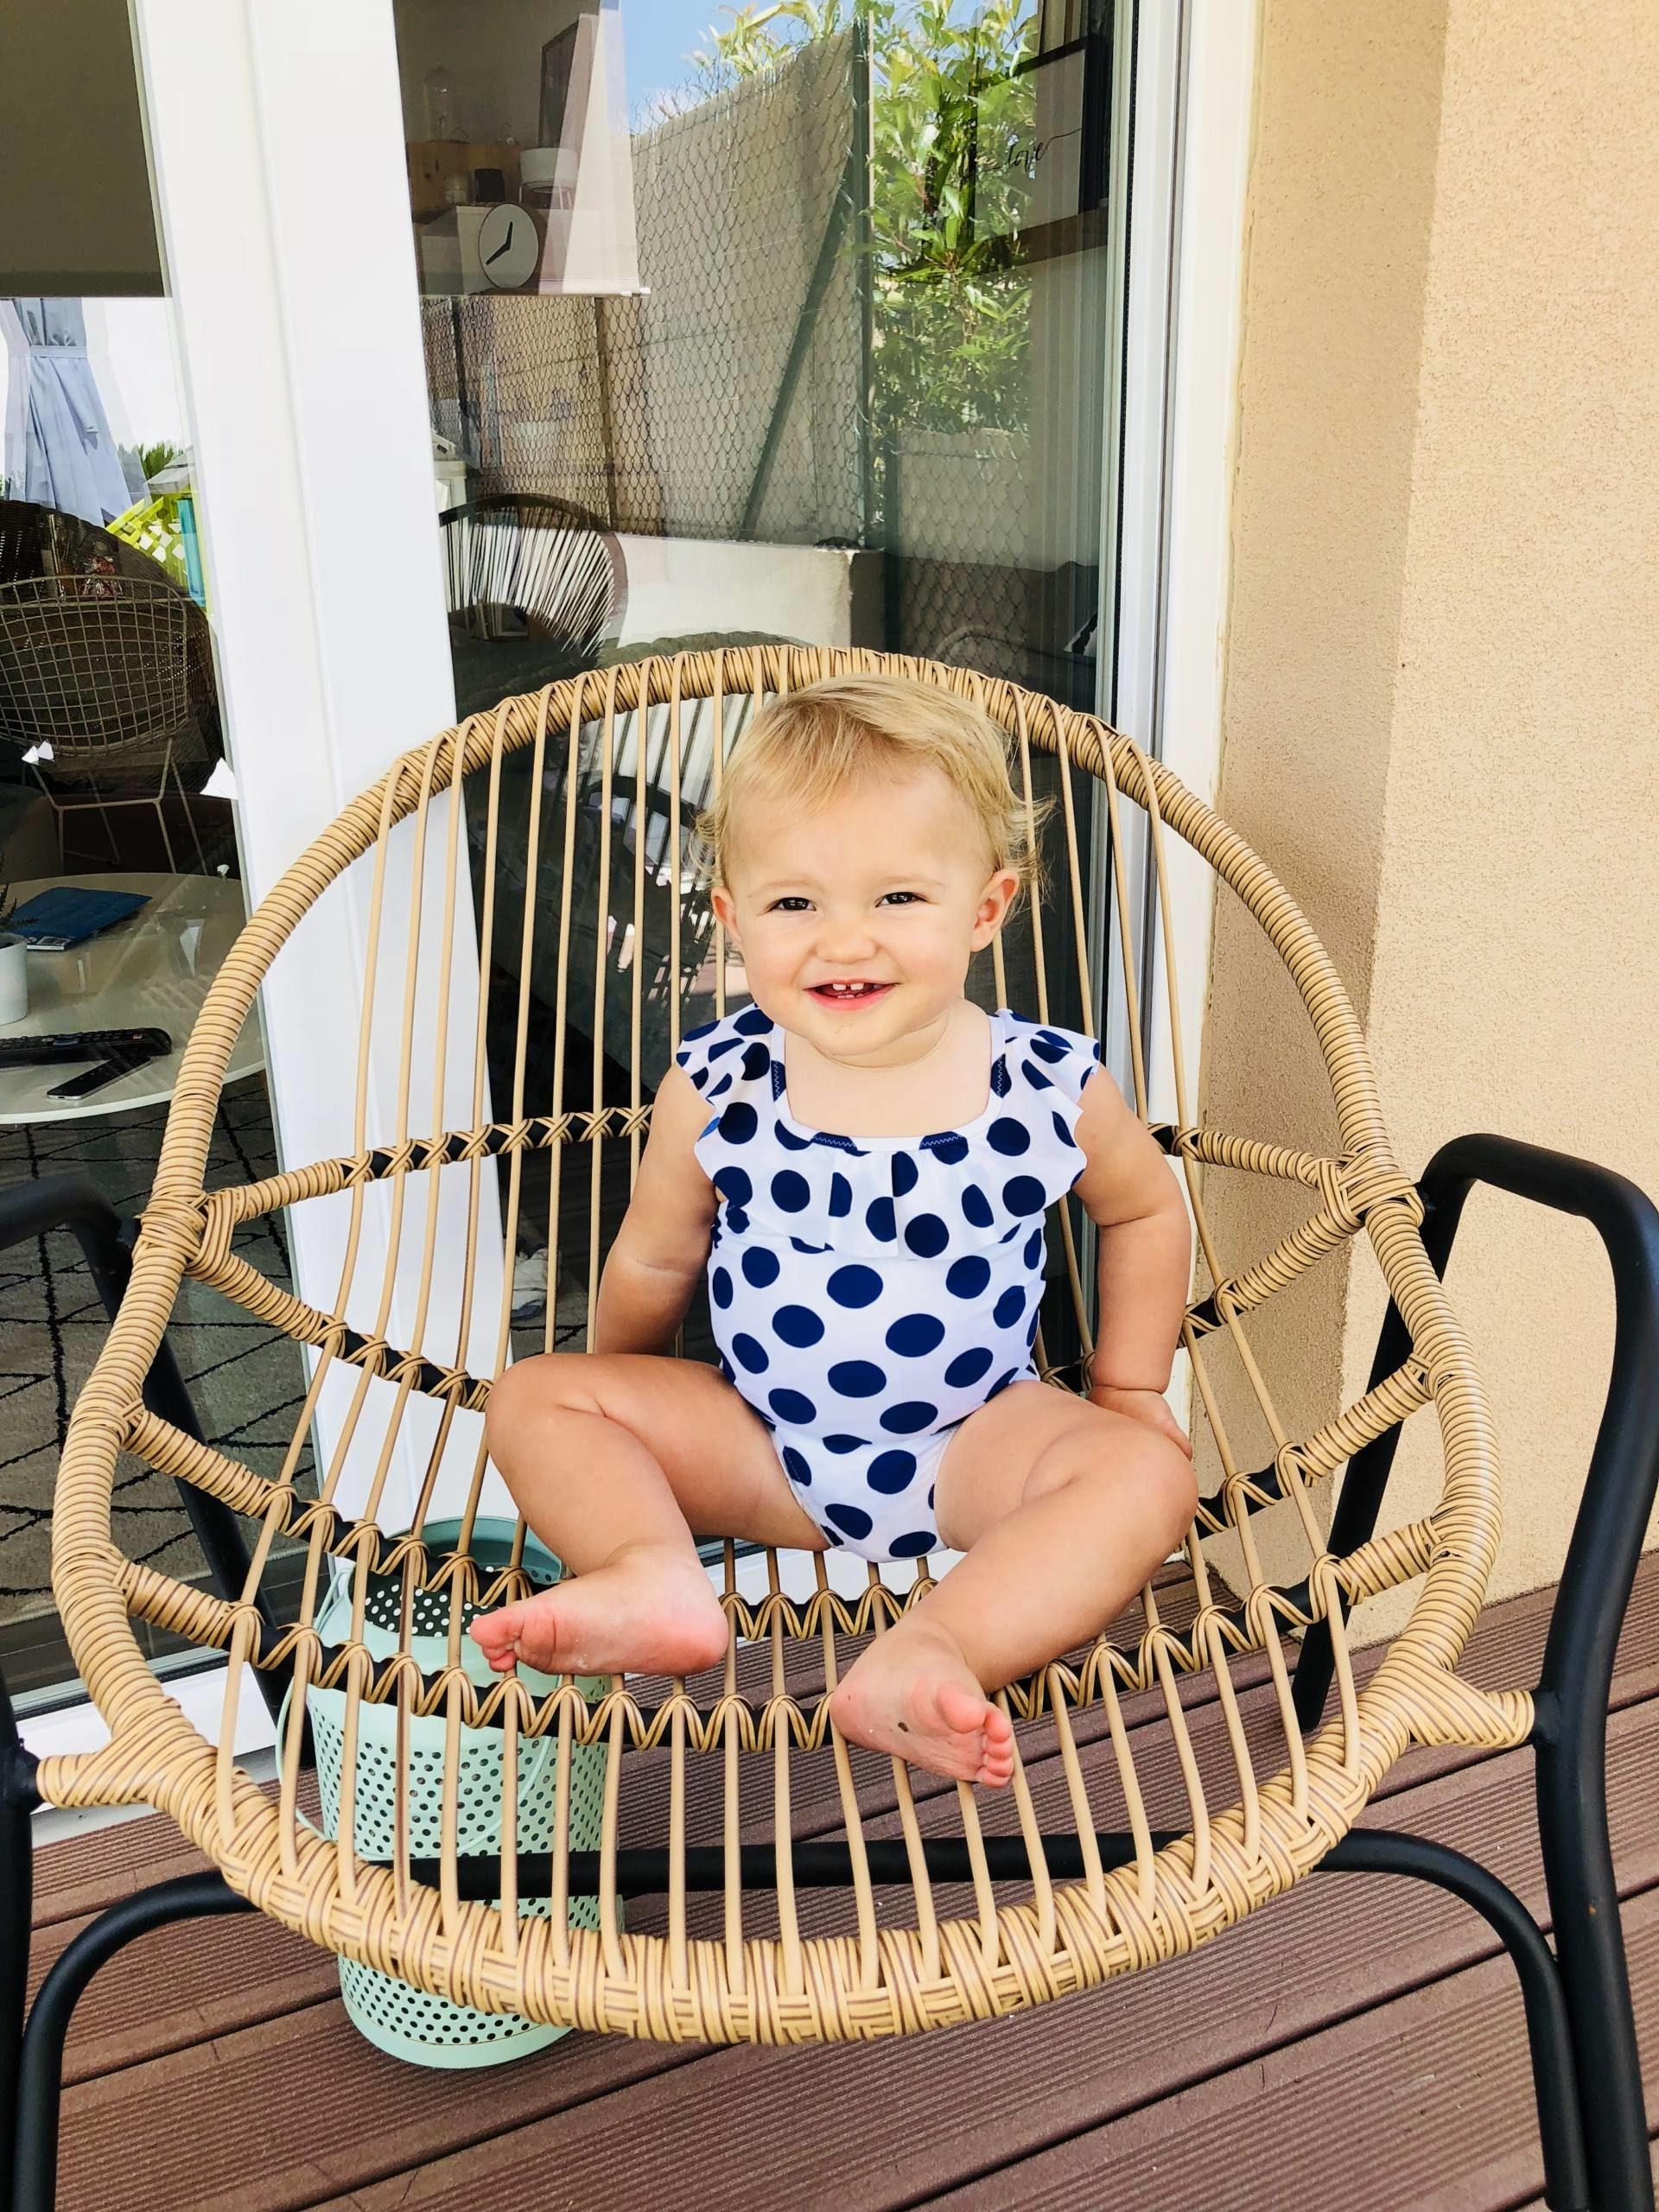 maillot de bain bébé Zara